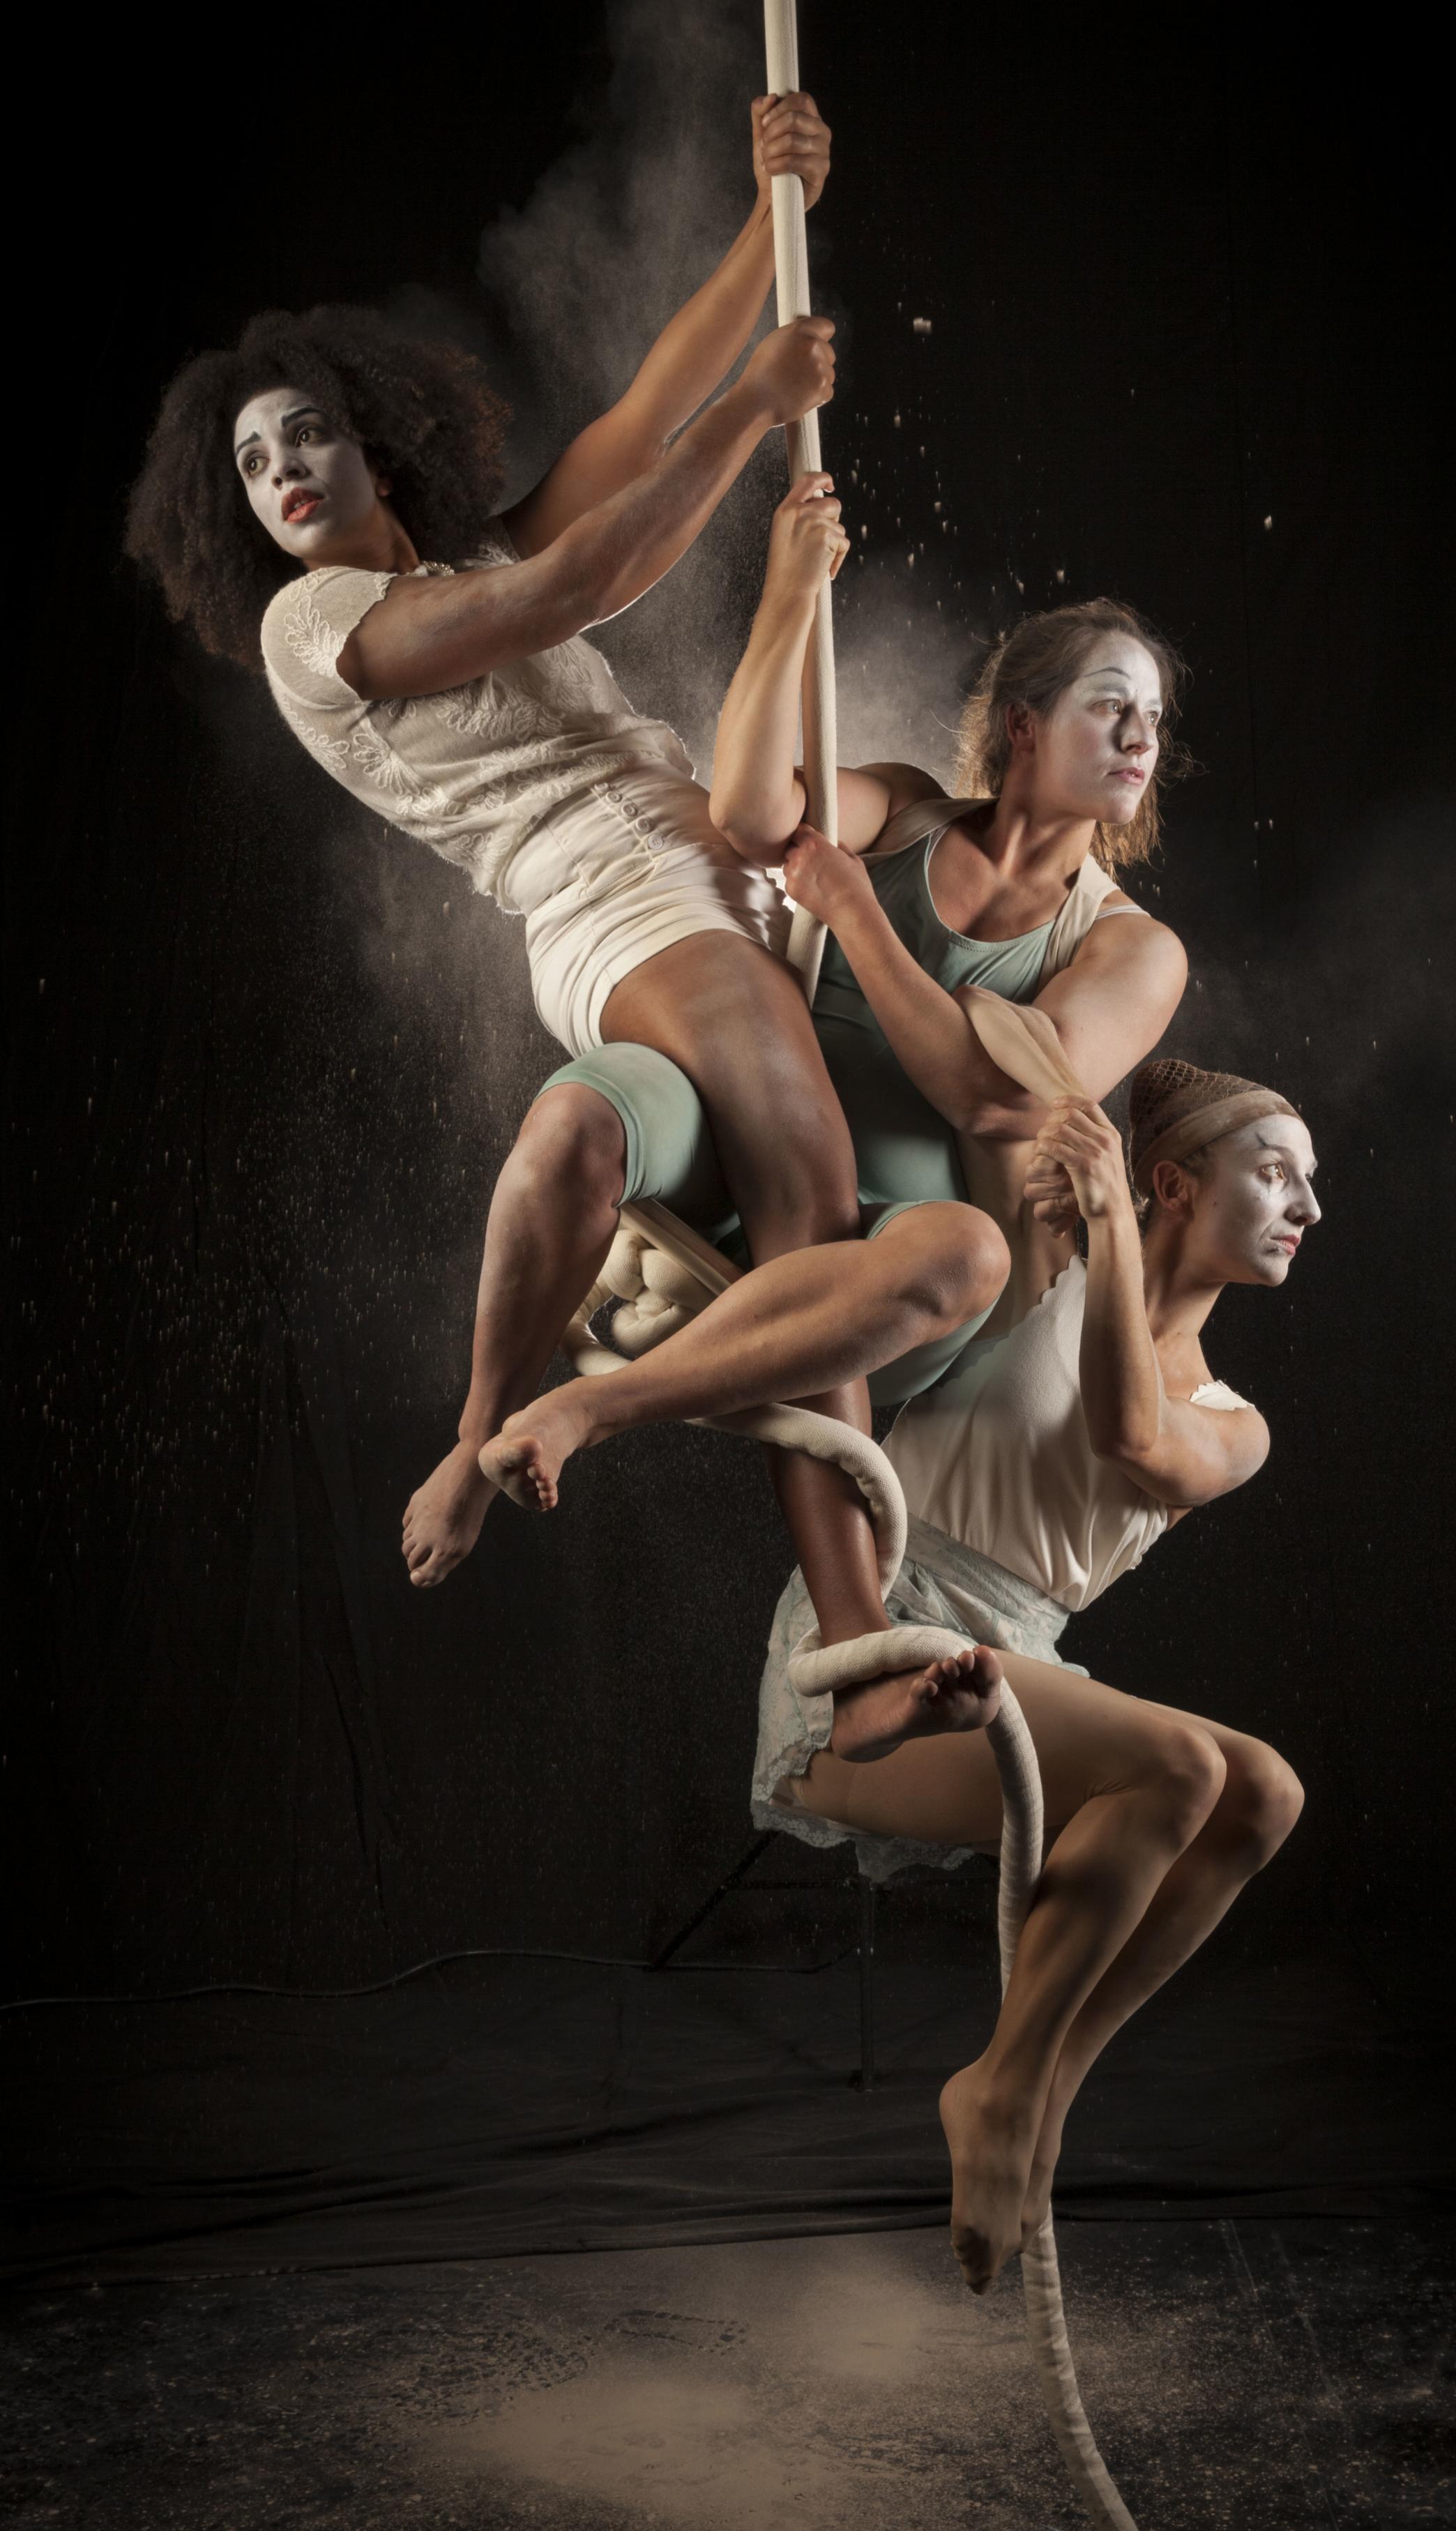 Company: MIMBRE. Show: EXPLODED CIRCUS. Photo: ERIC RICHMOND